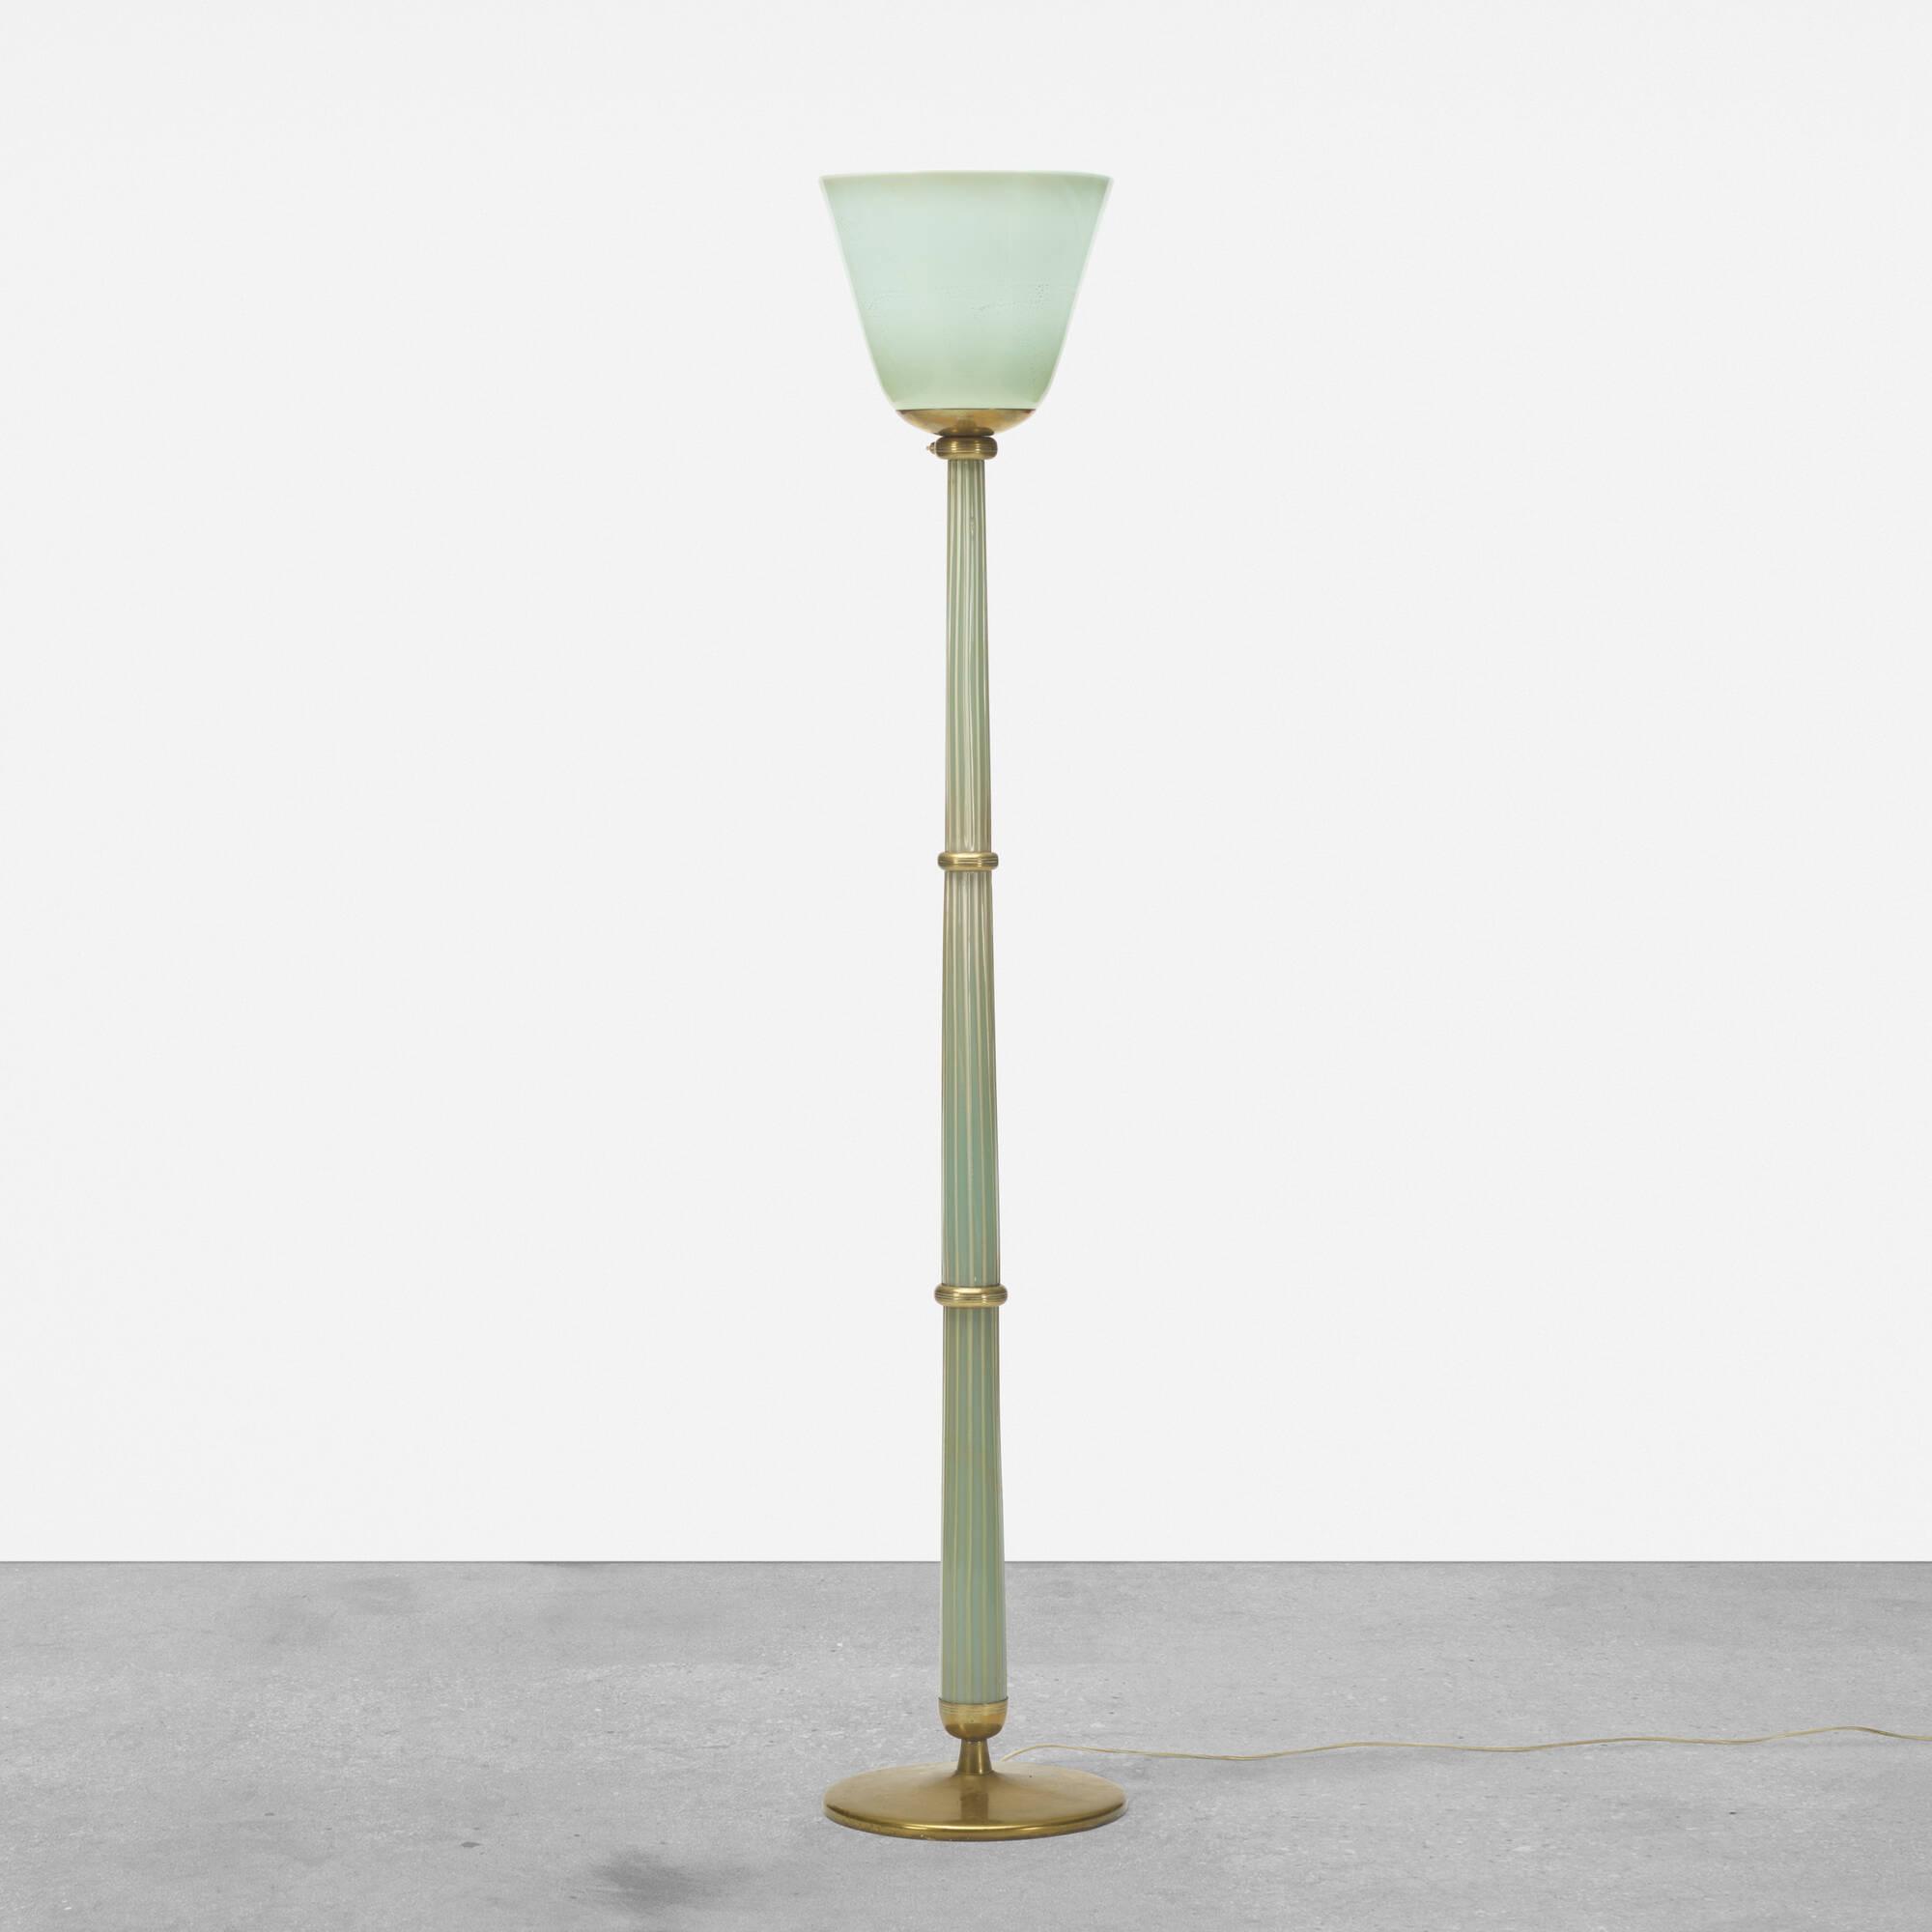 192: Tomaso Buzzi / floor lamp, model 502 (1 of 3)